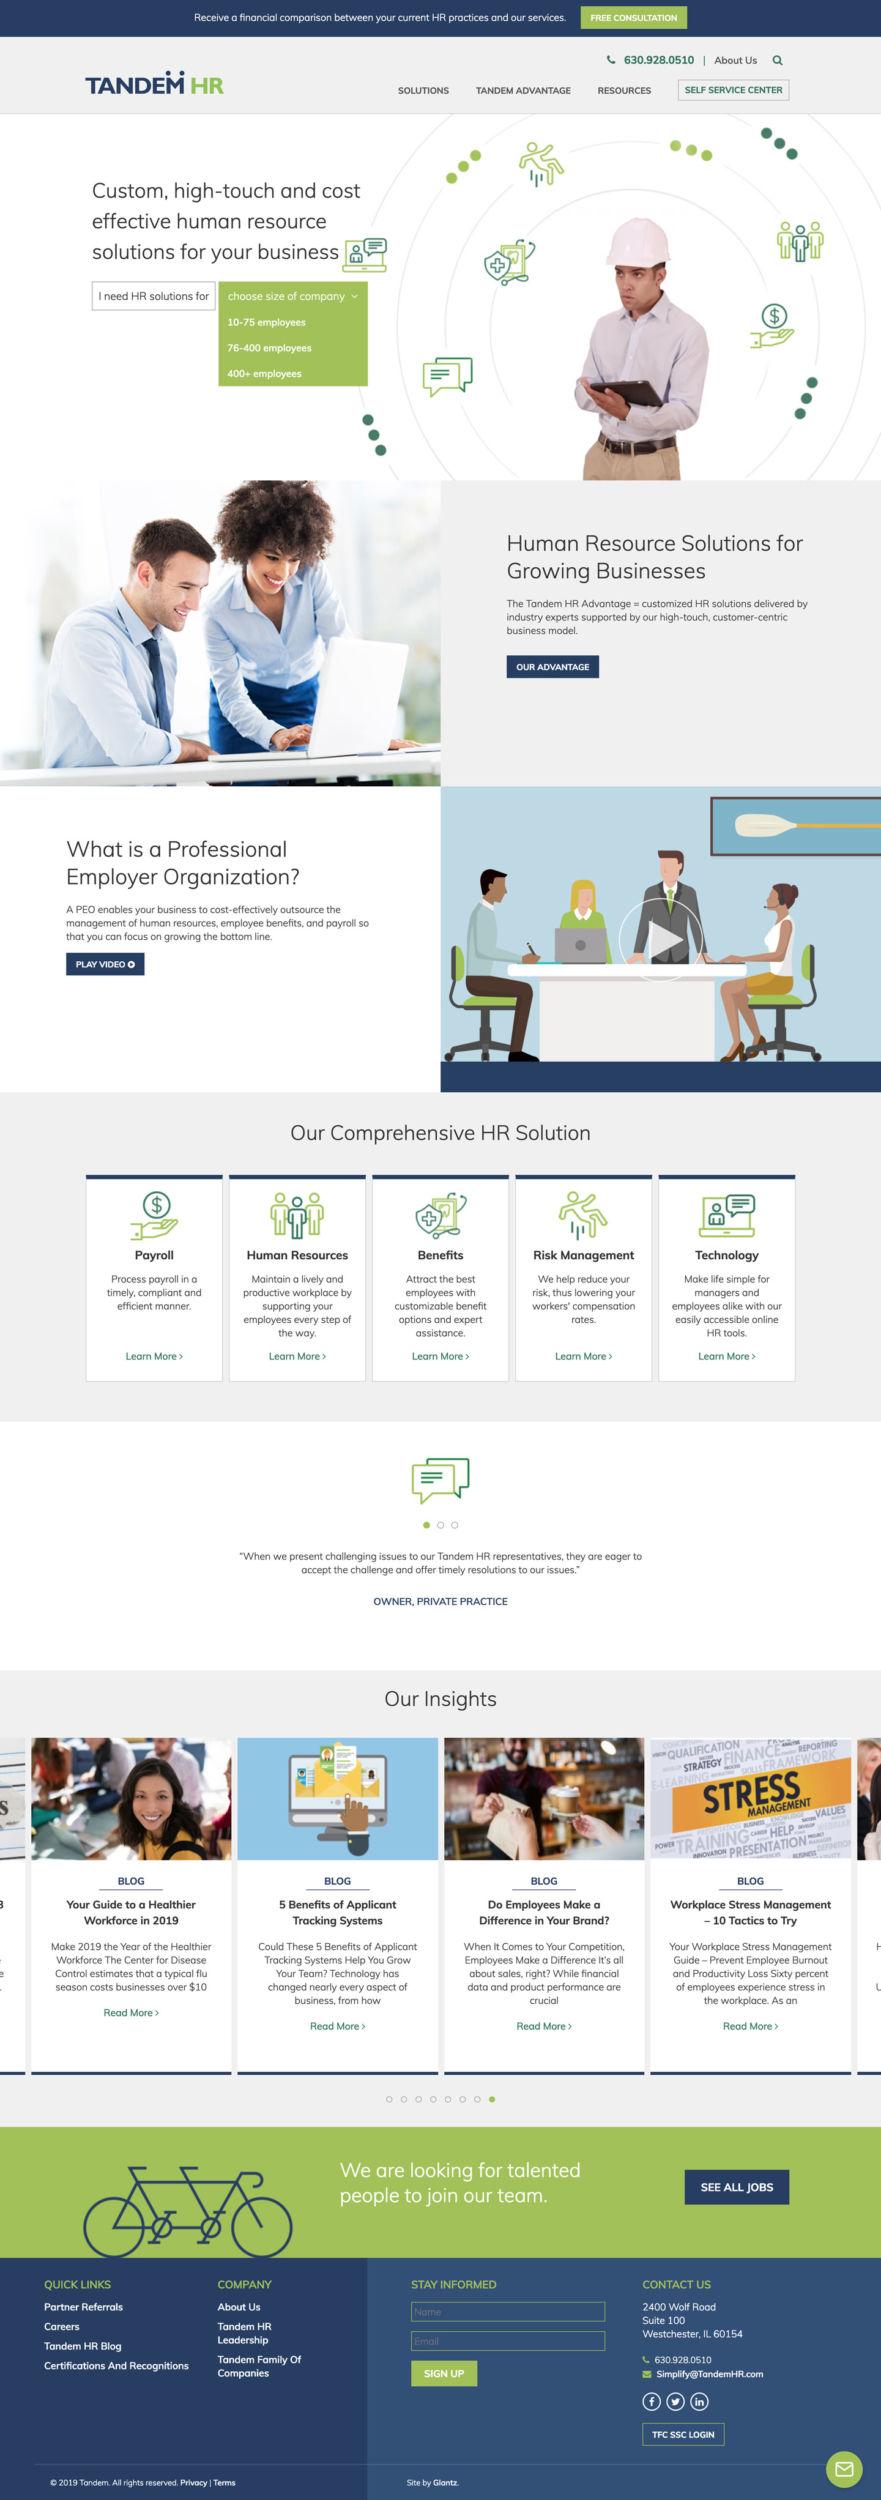 Tandem HR Website Scroll